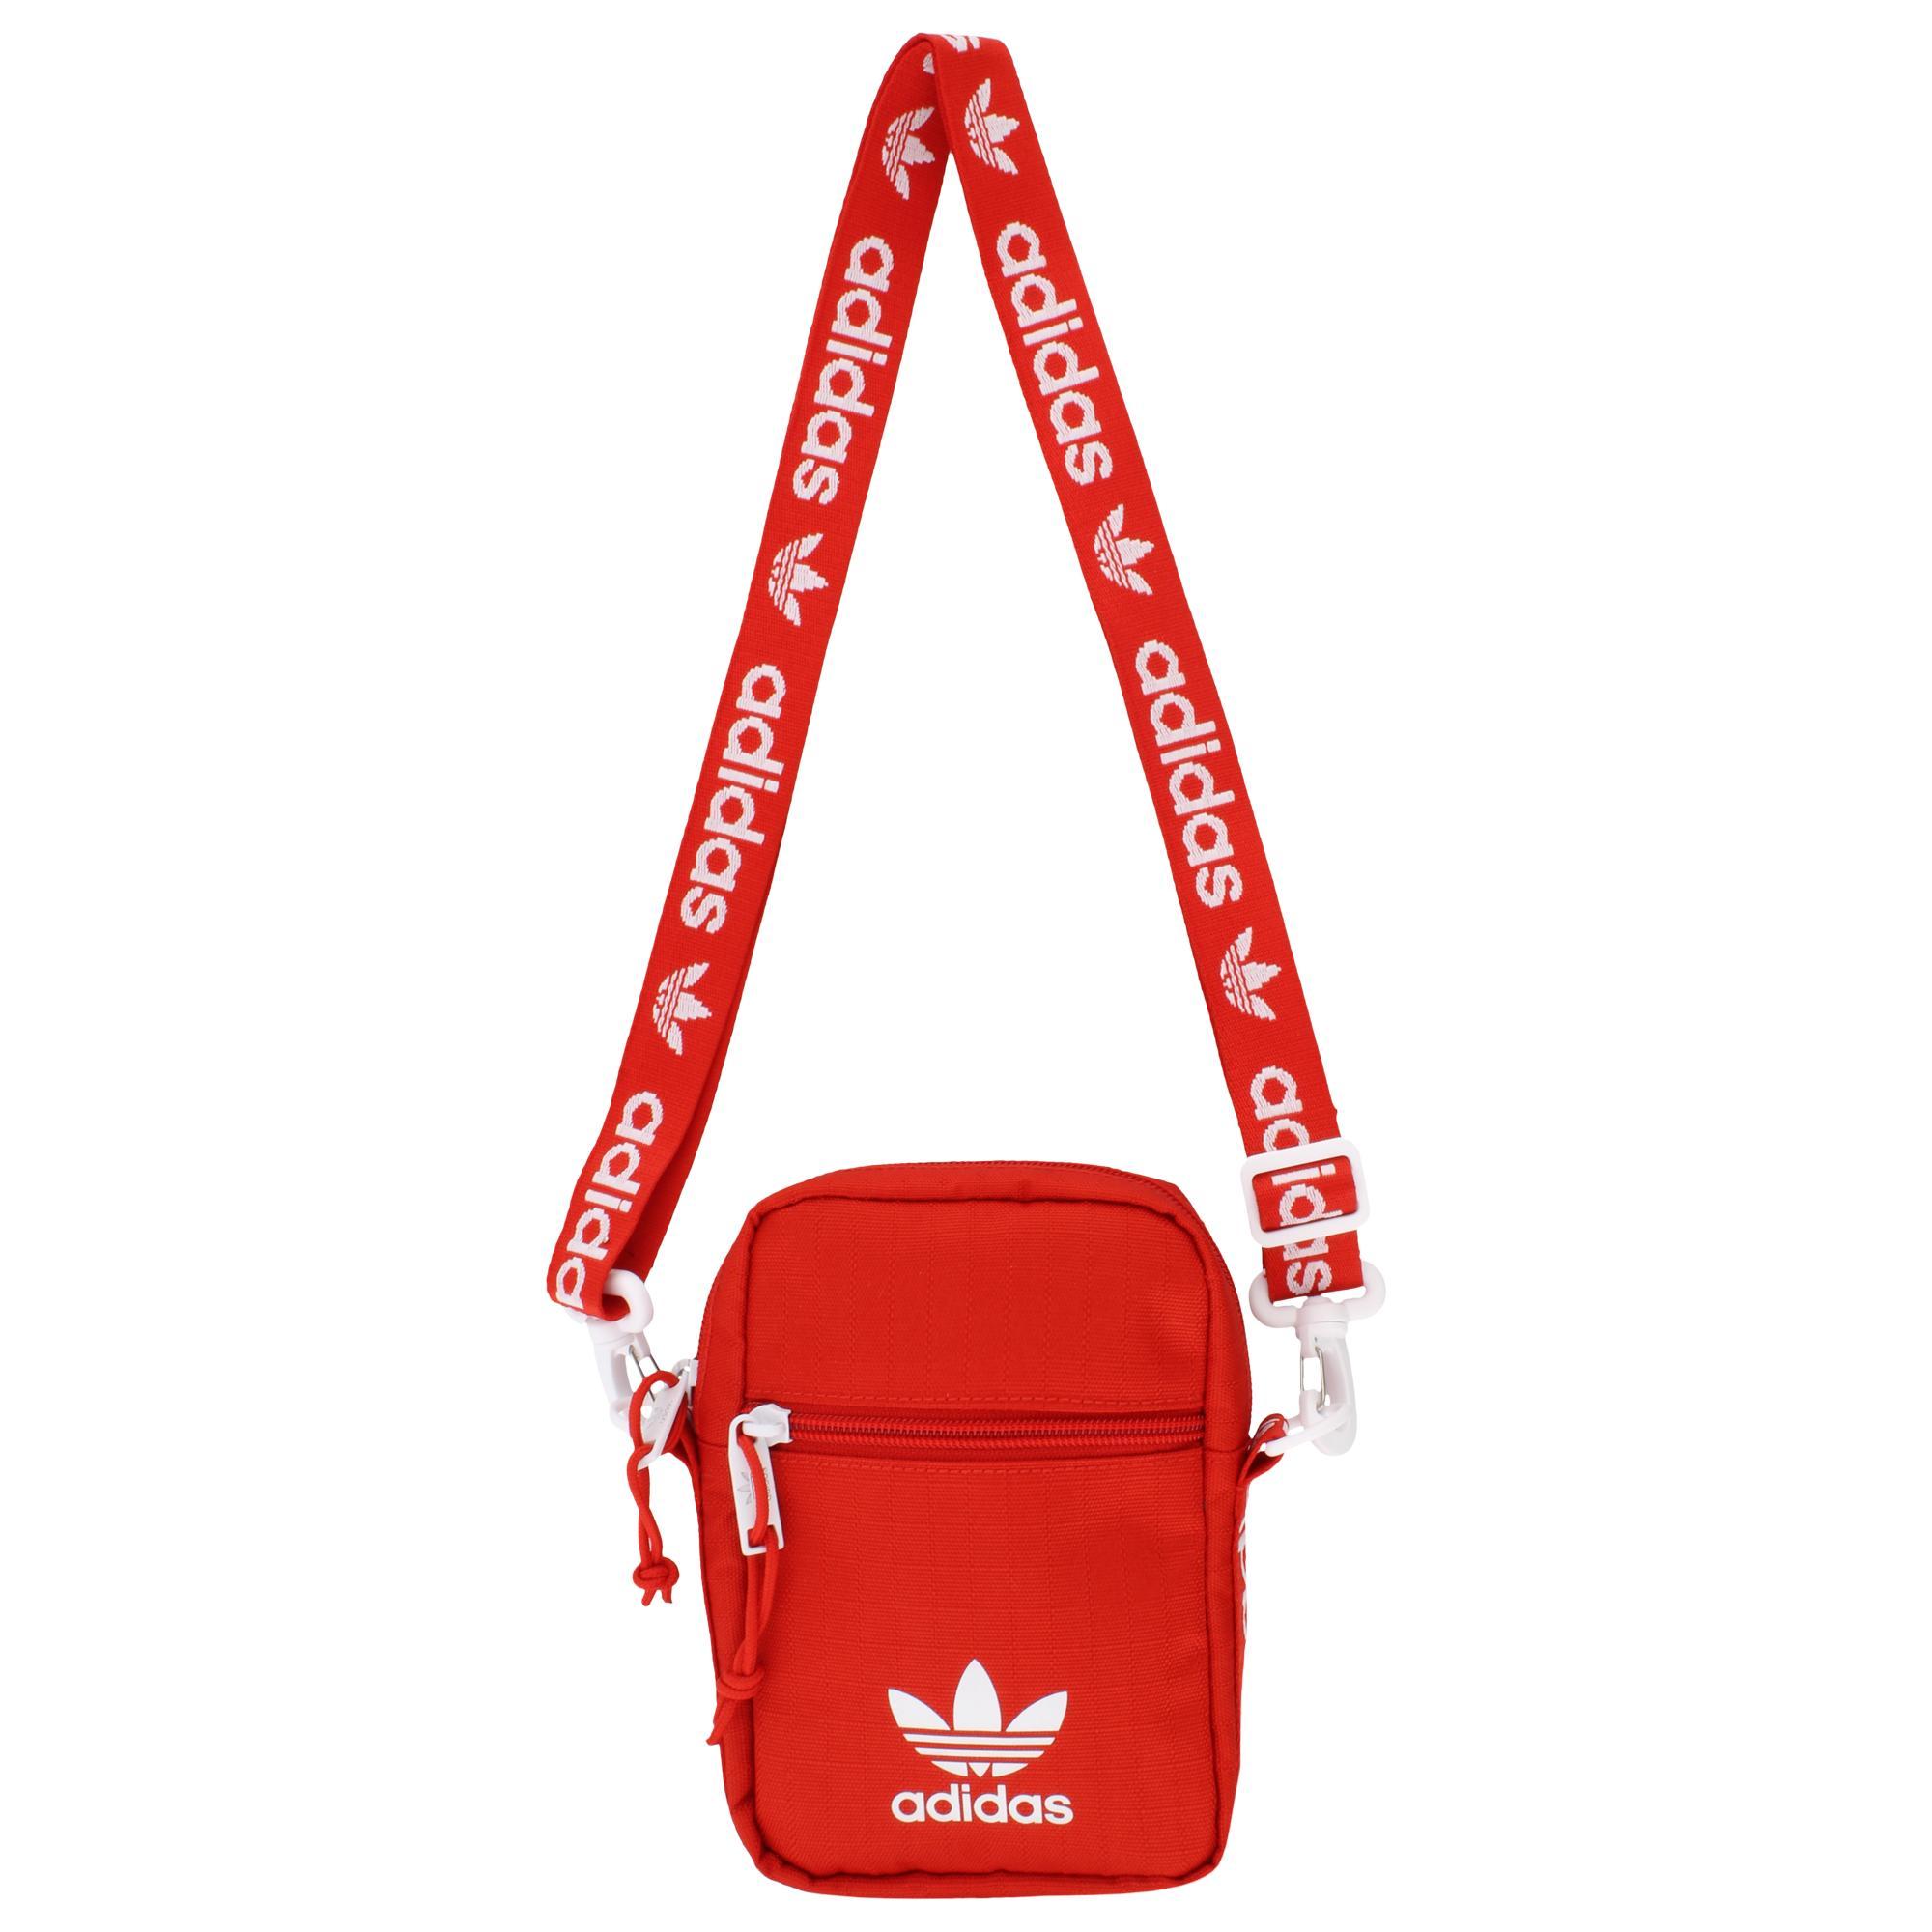 46c91f66f5 Lyst - adidas Originals Shoulder Strap Festival Bag in Red